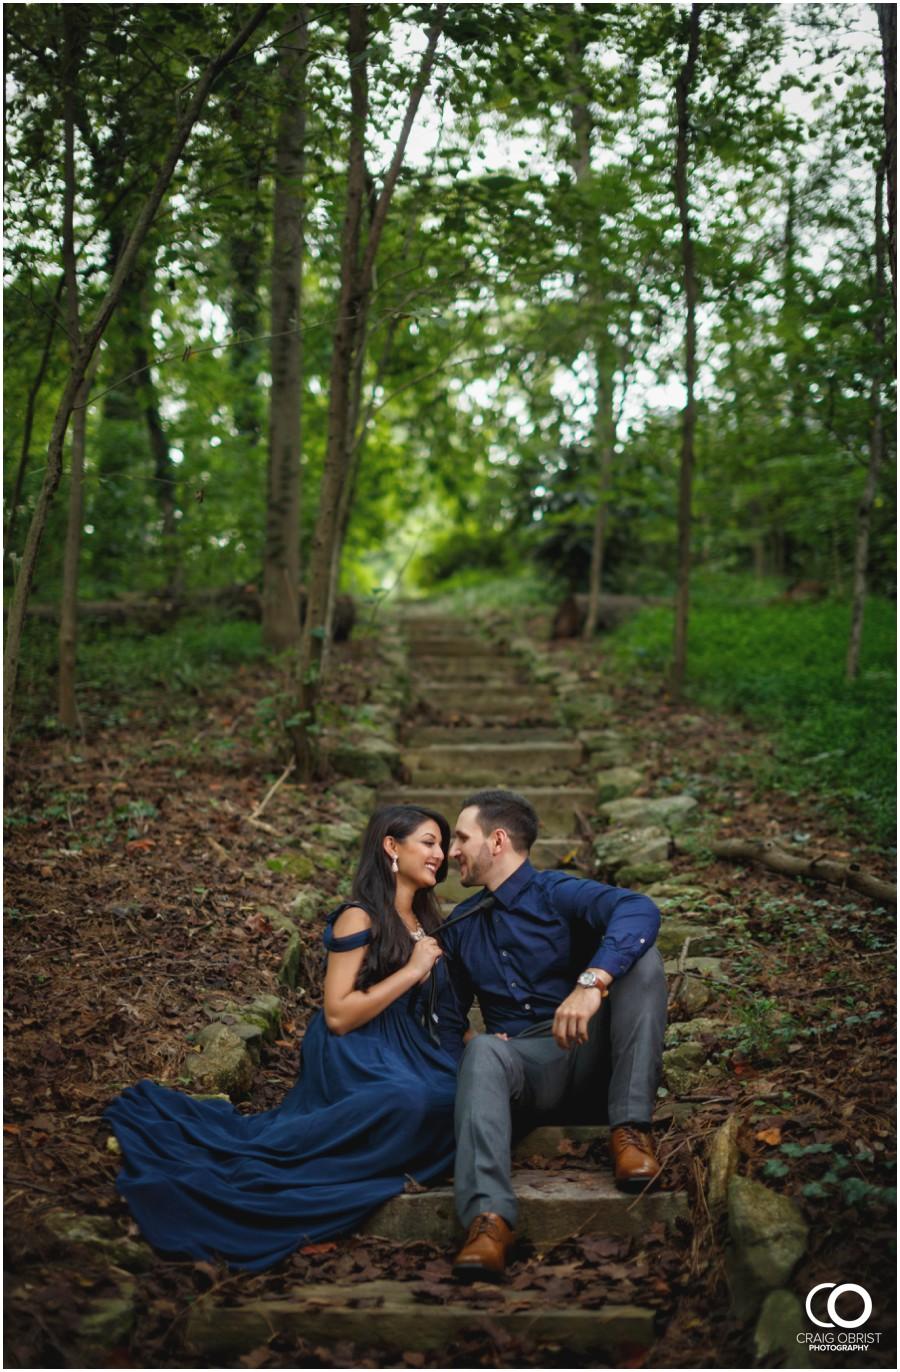 Emory-Lullwater-Park-Engagement-Portraits_0017.jpg